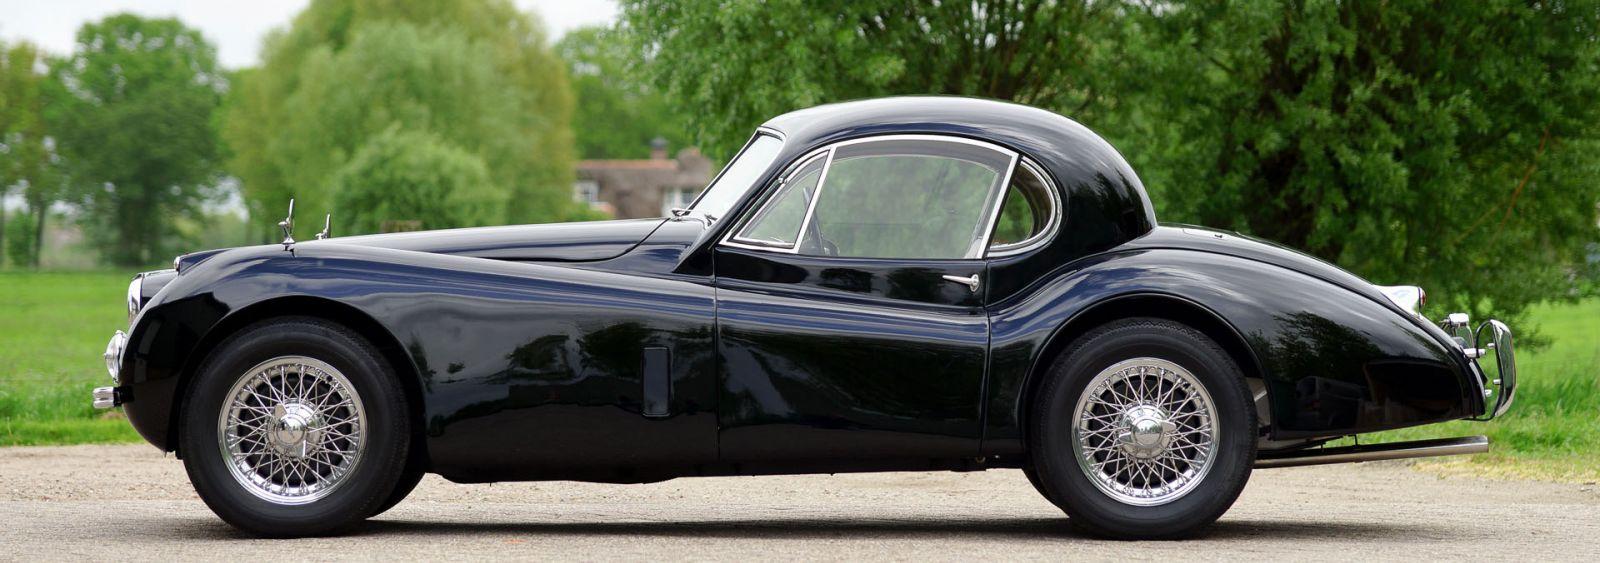 jaguar xk 120 fhc 1954 classicargarage de. Black Bedroom Furniture Sets. Home Design Ideas